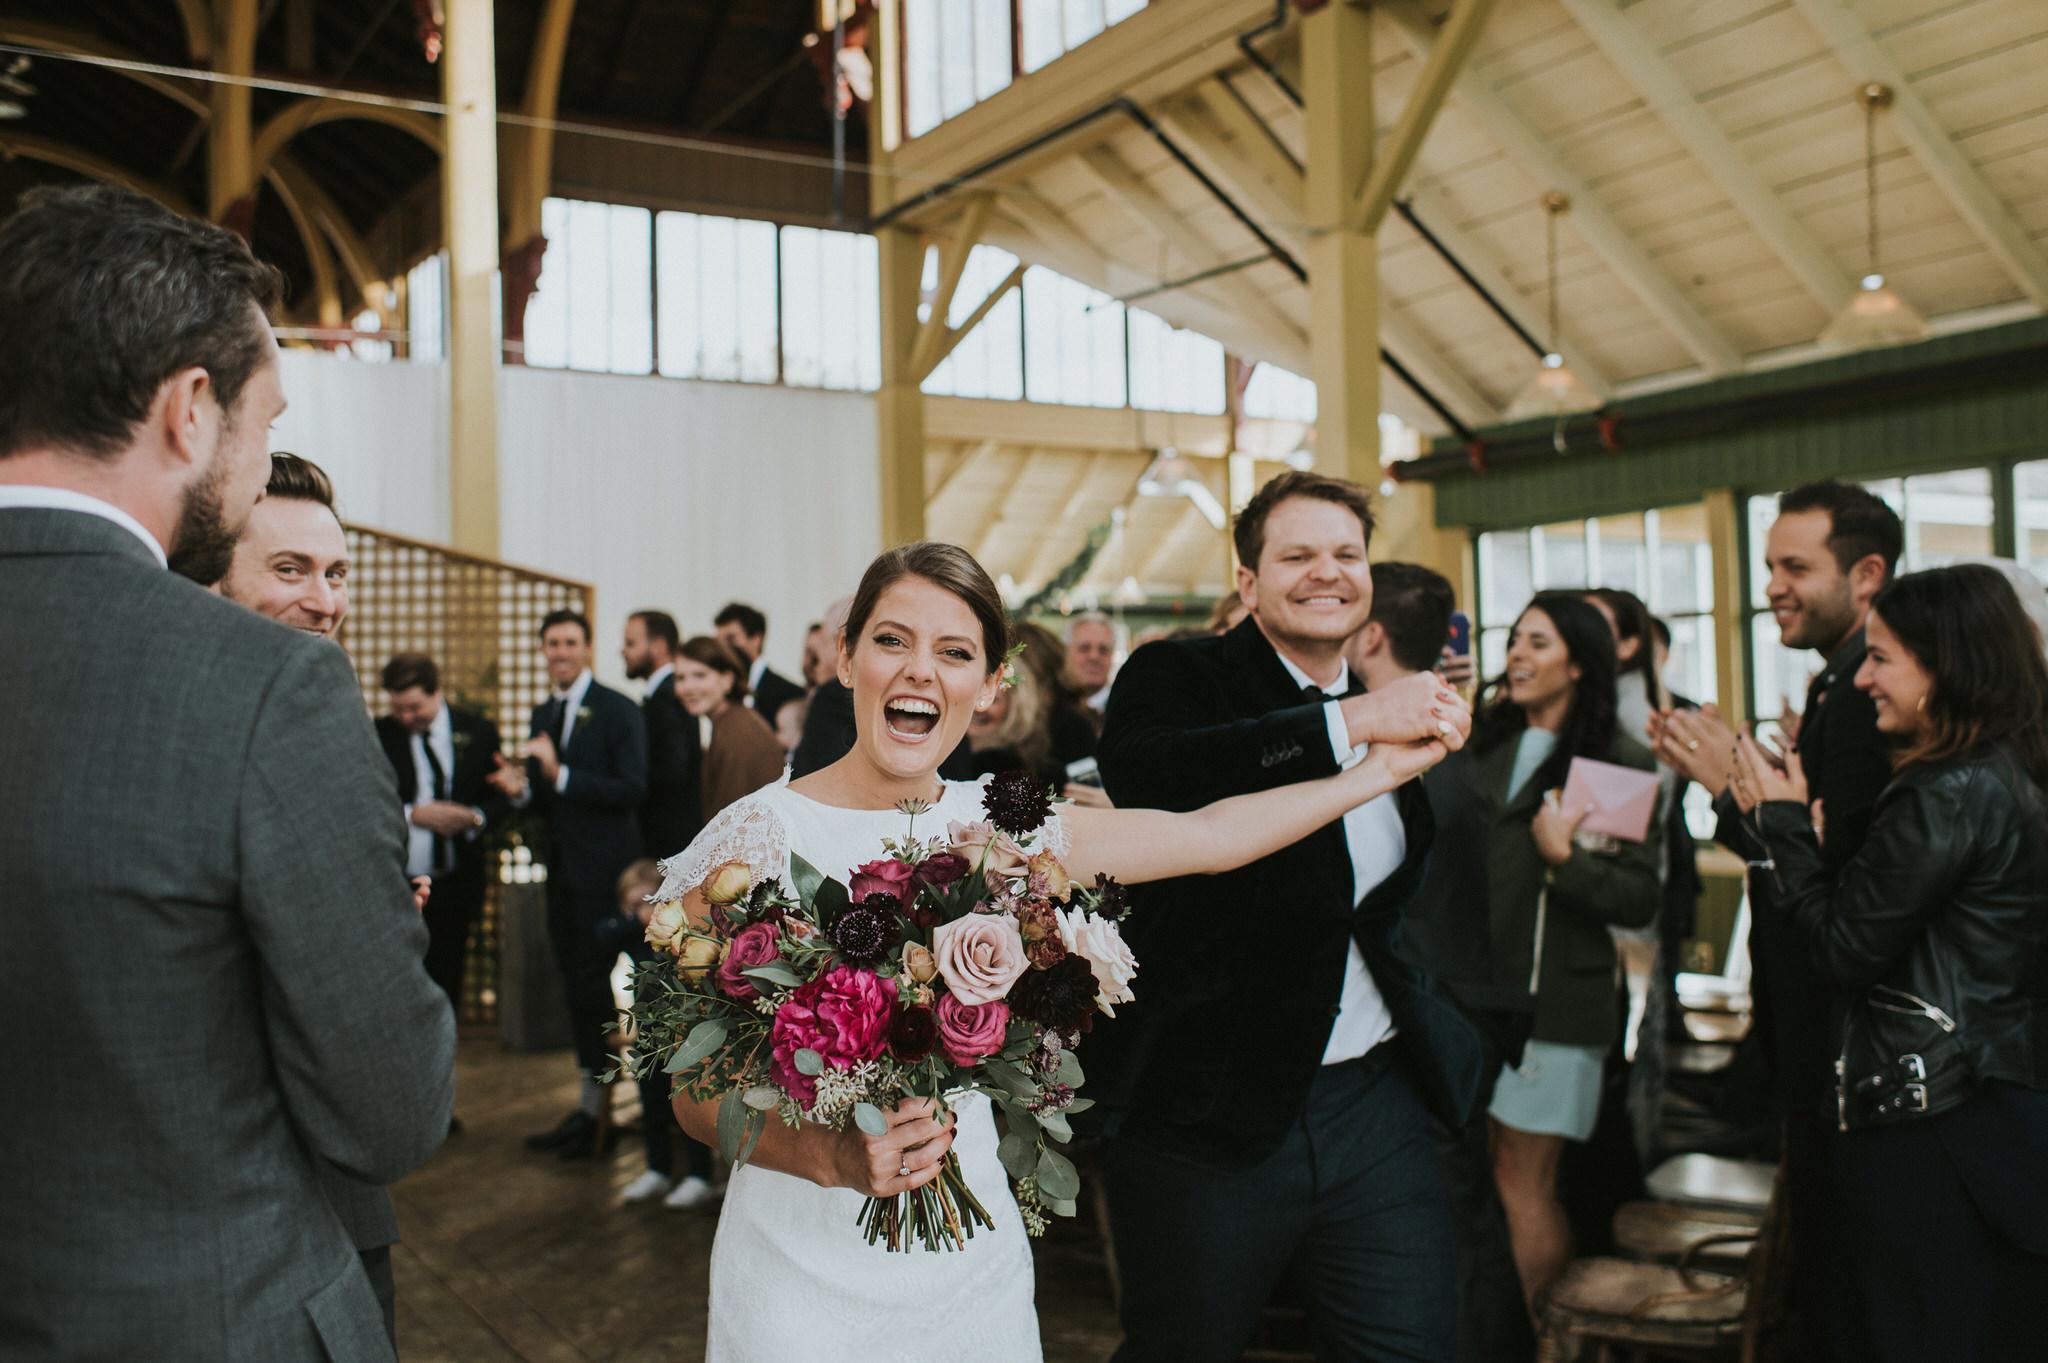 scarletoneillphotography_weddingphotography_prince edward county weddings124.JPG